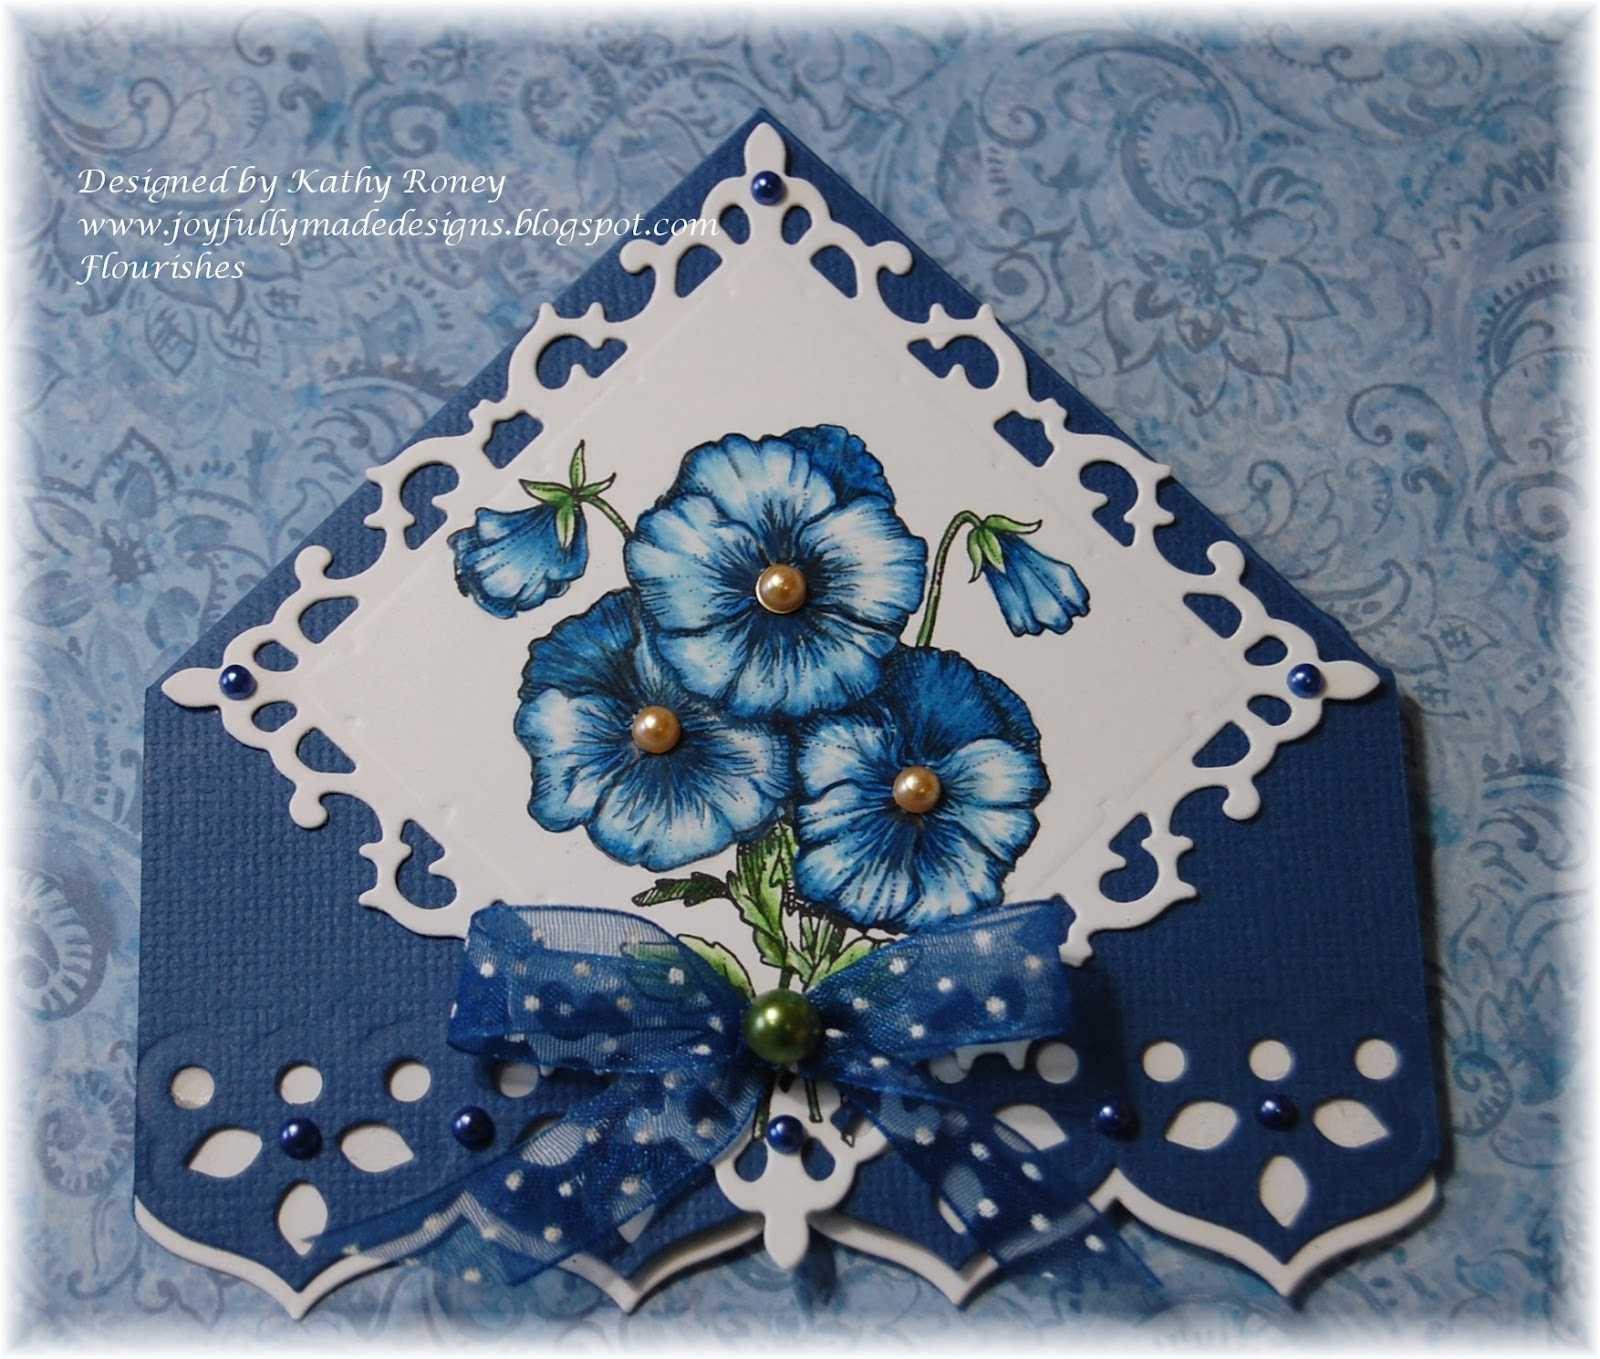 joyfully made designs corner bookmark flourishes fttc157